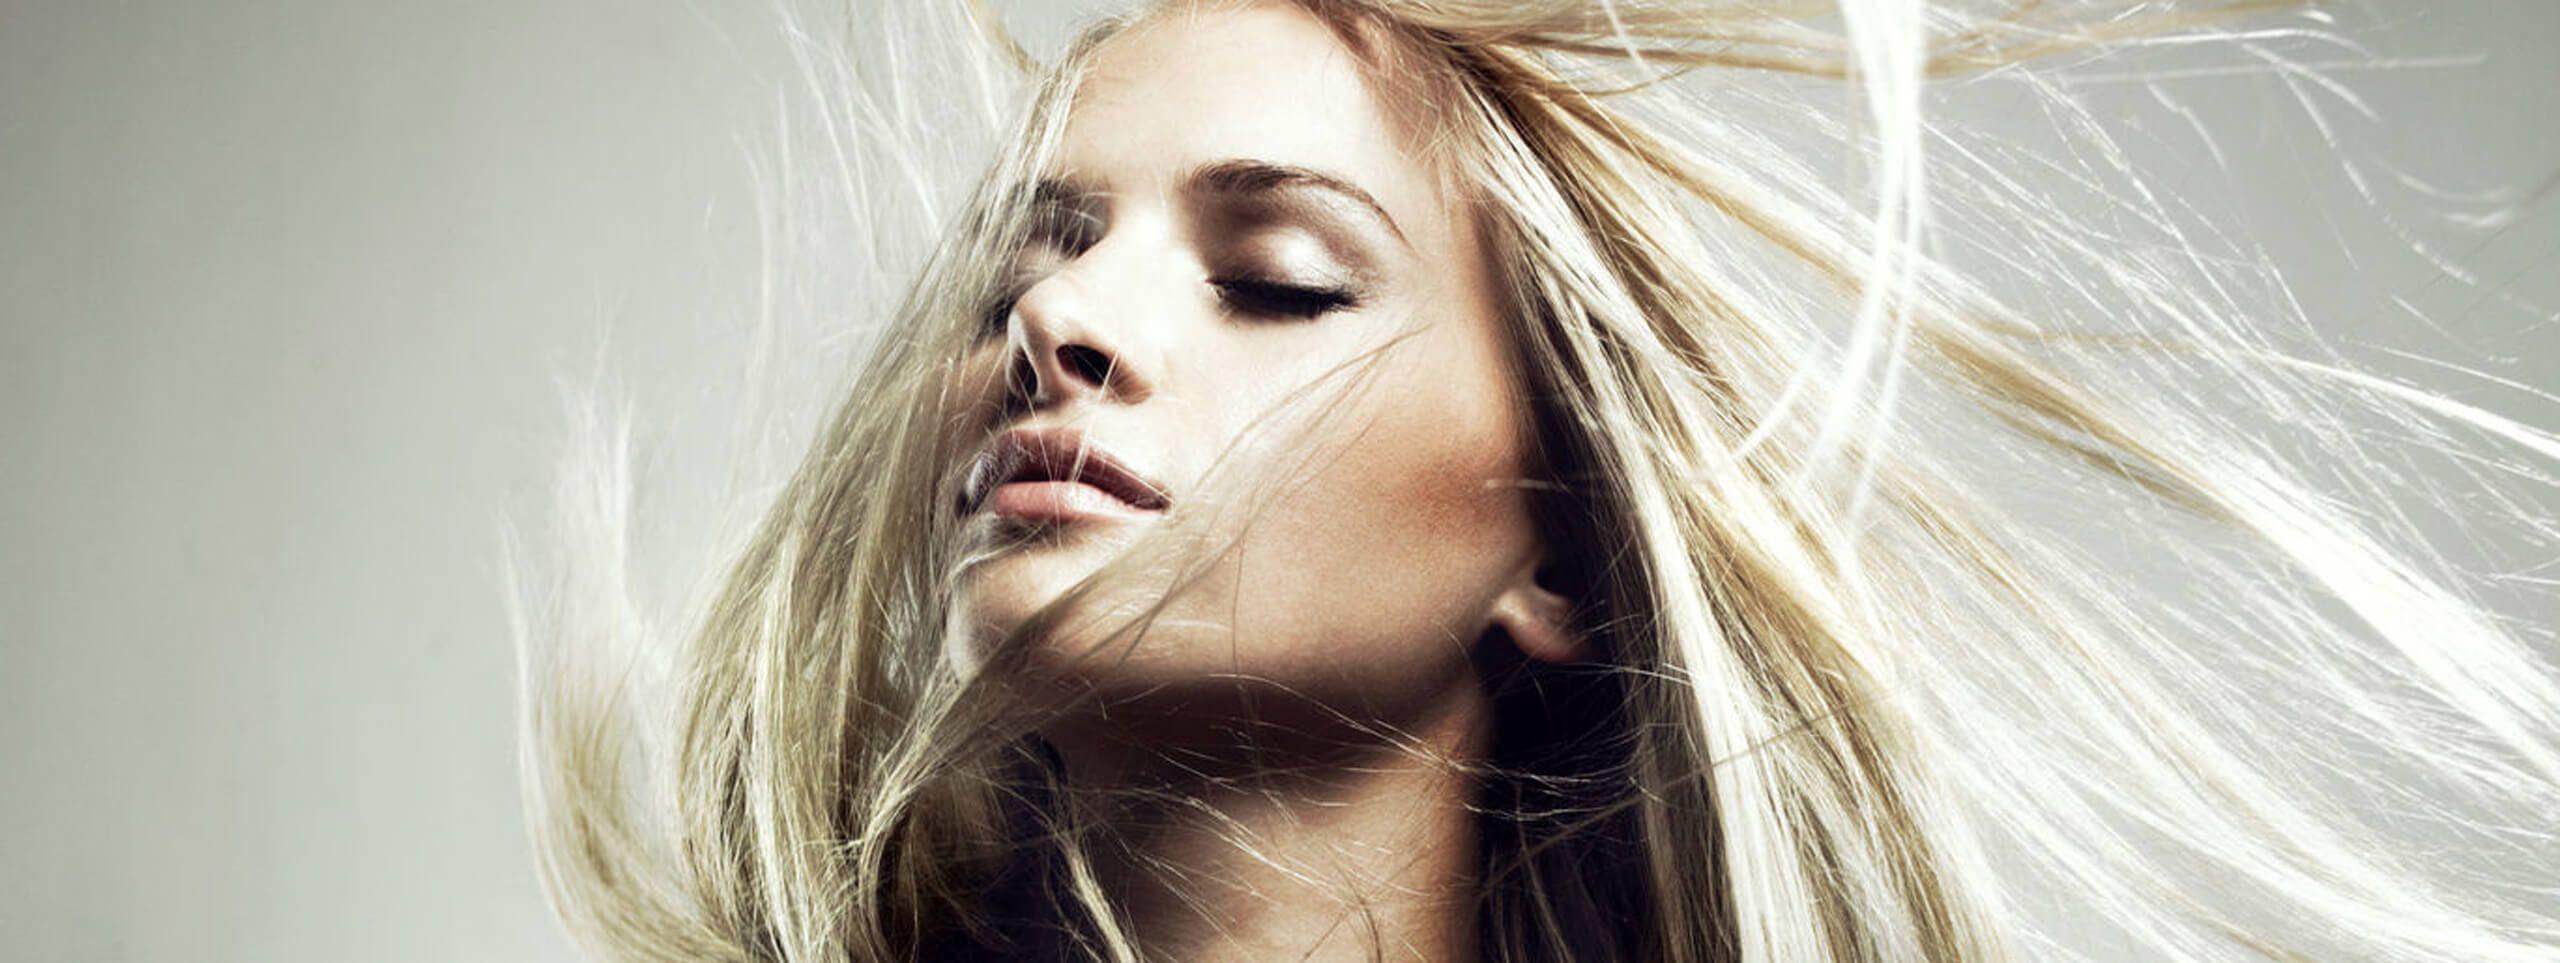 Chica pelo rubio largo y fino